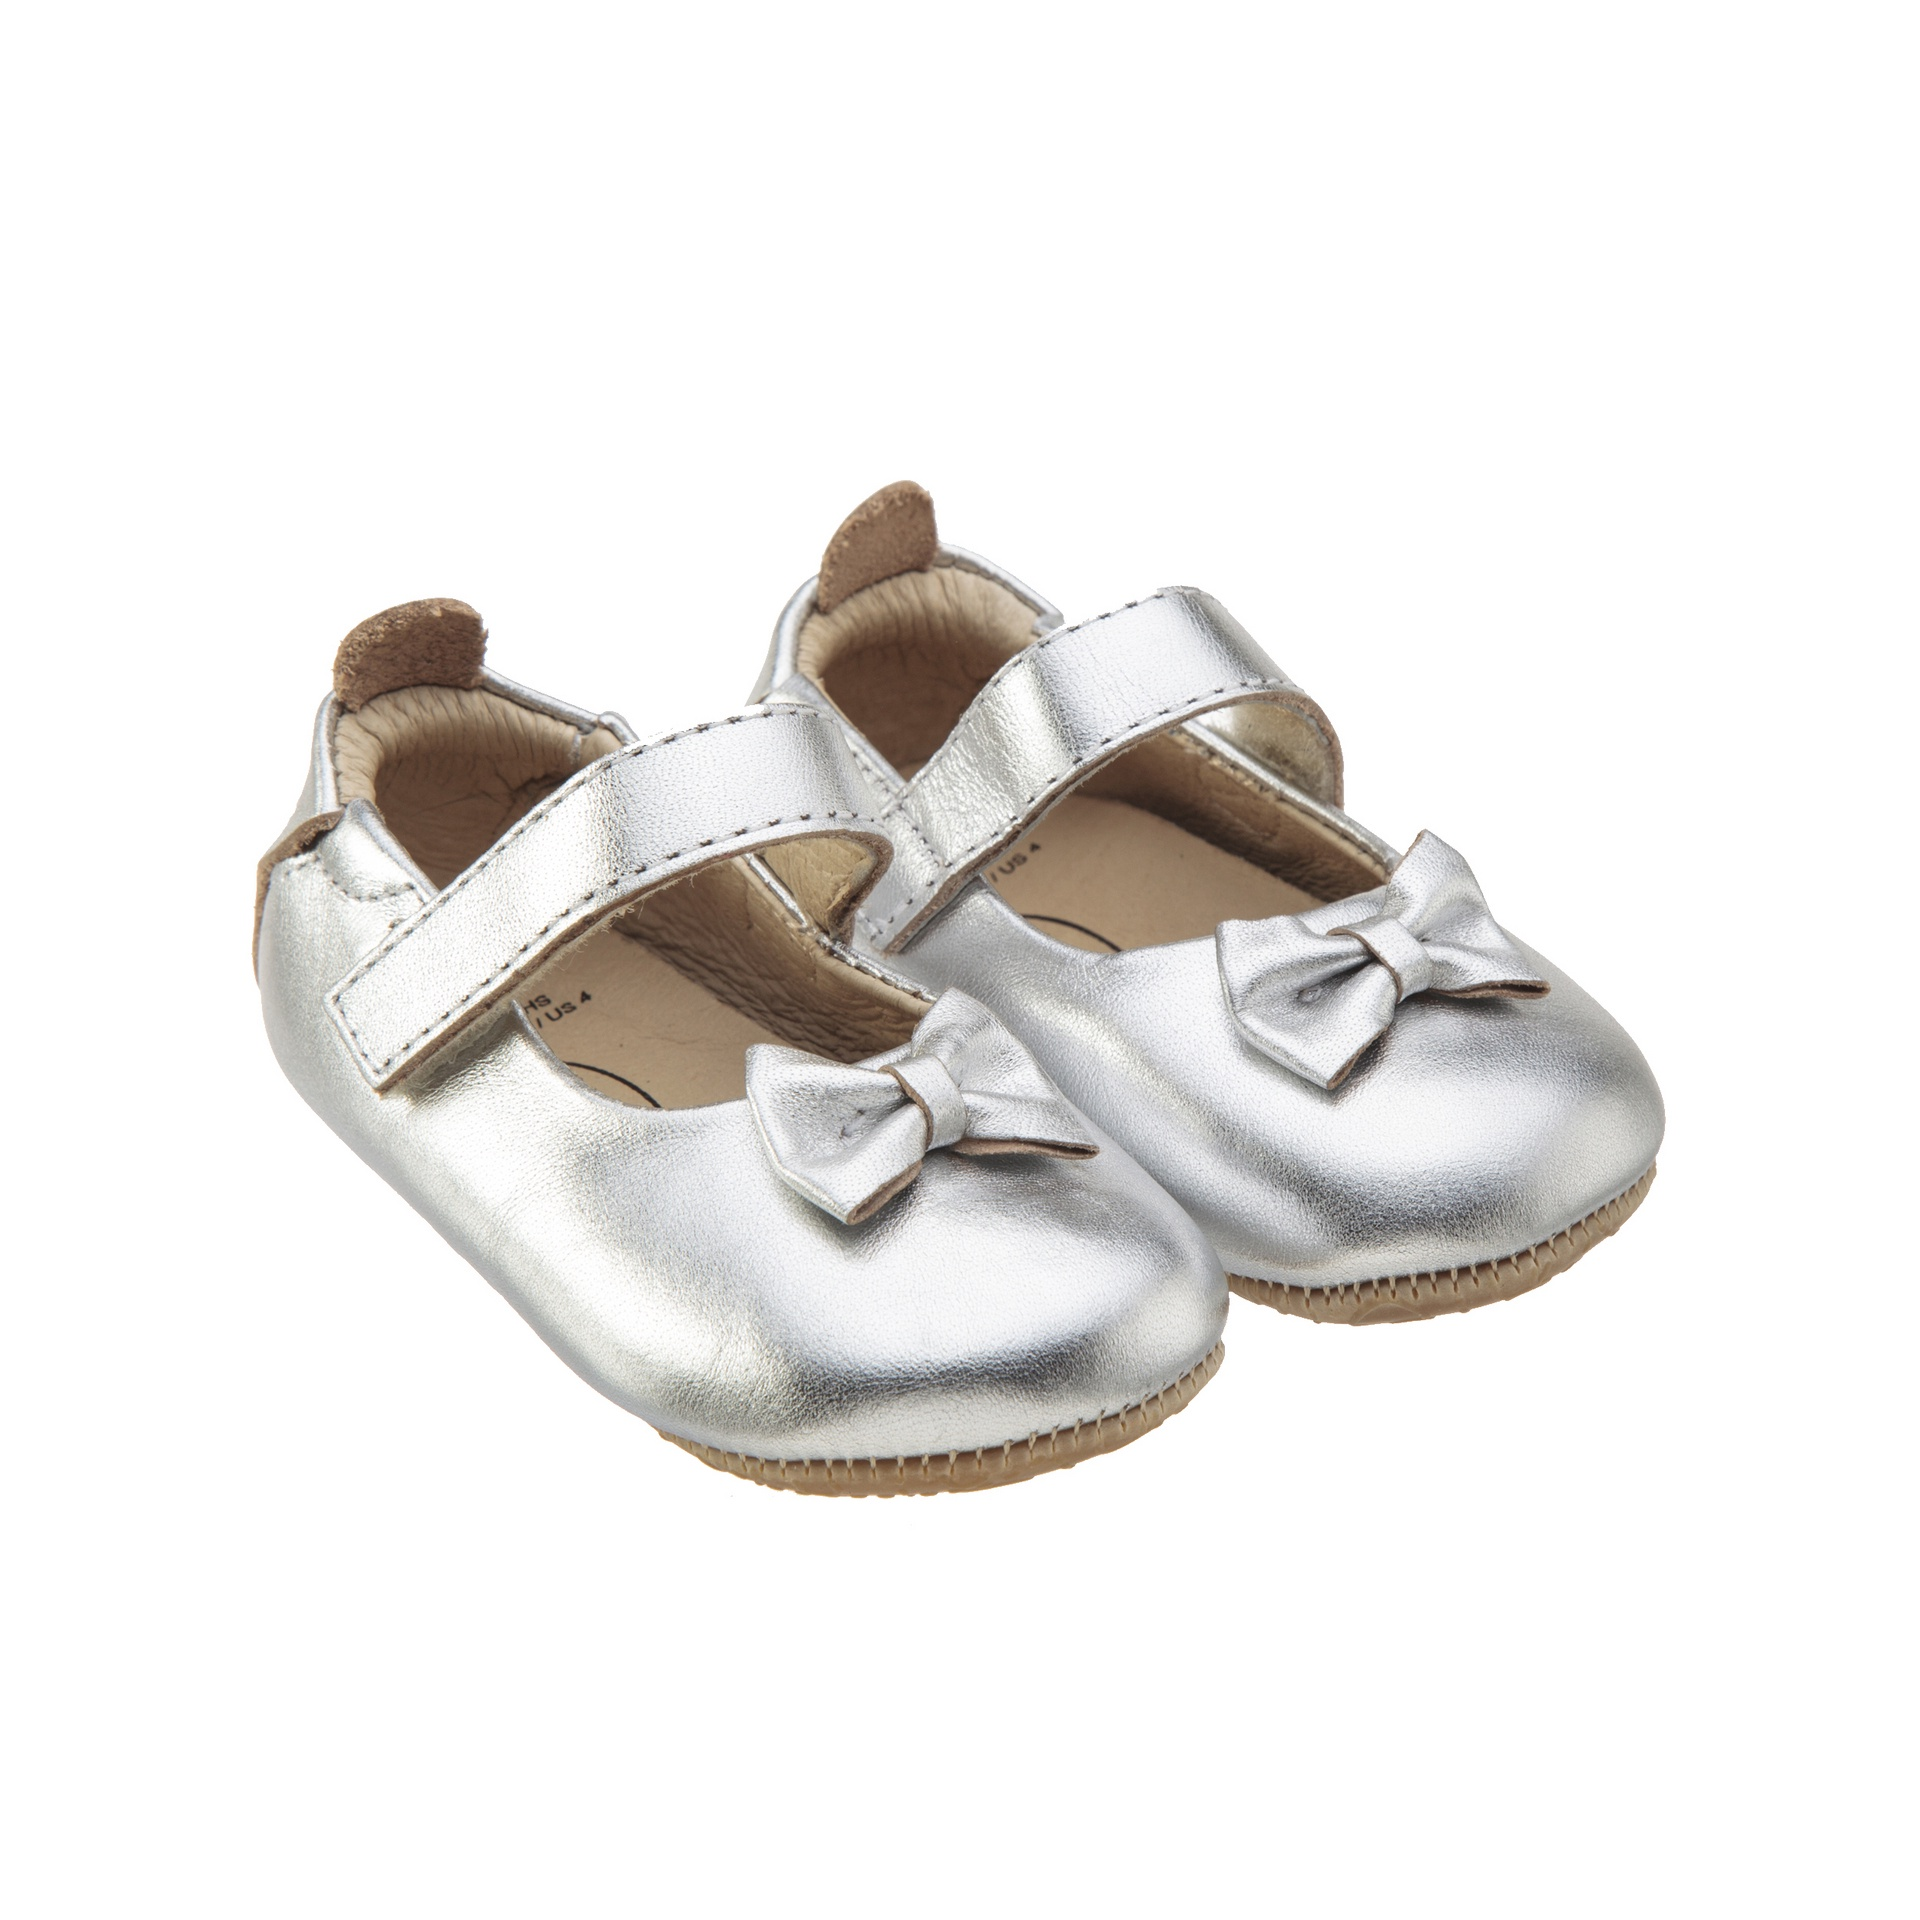 Old Soles Dream Shoe Silver Rubber Sole